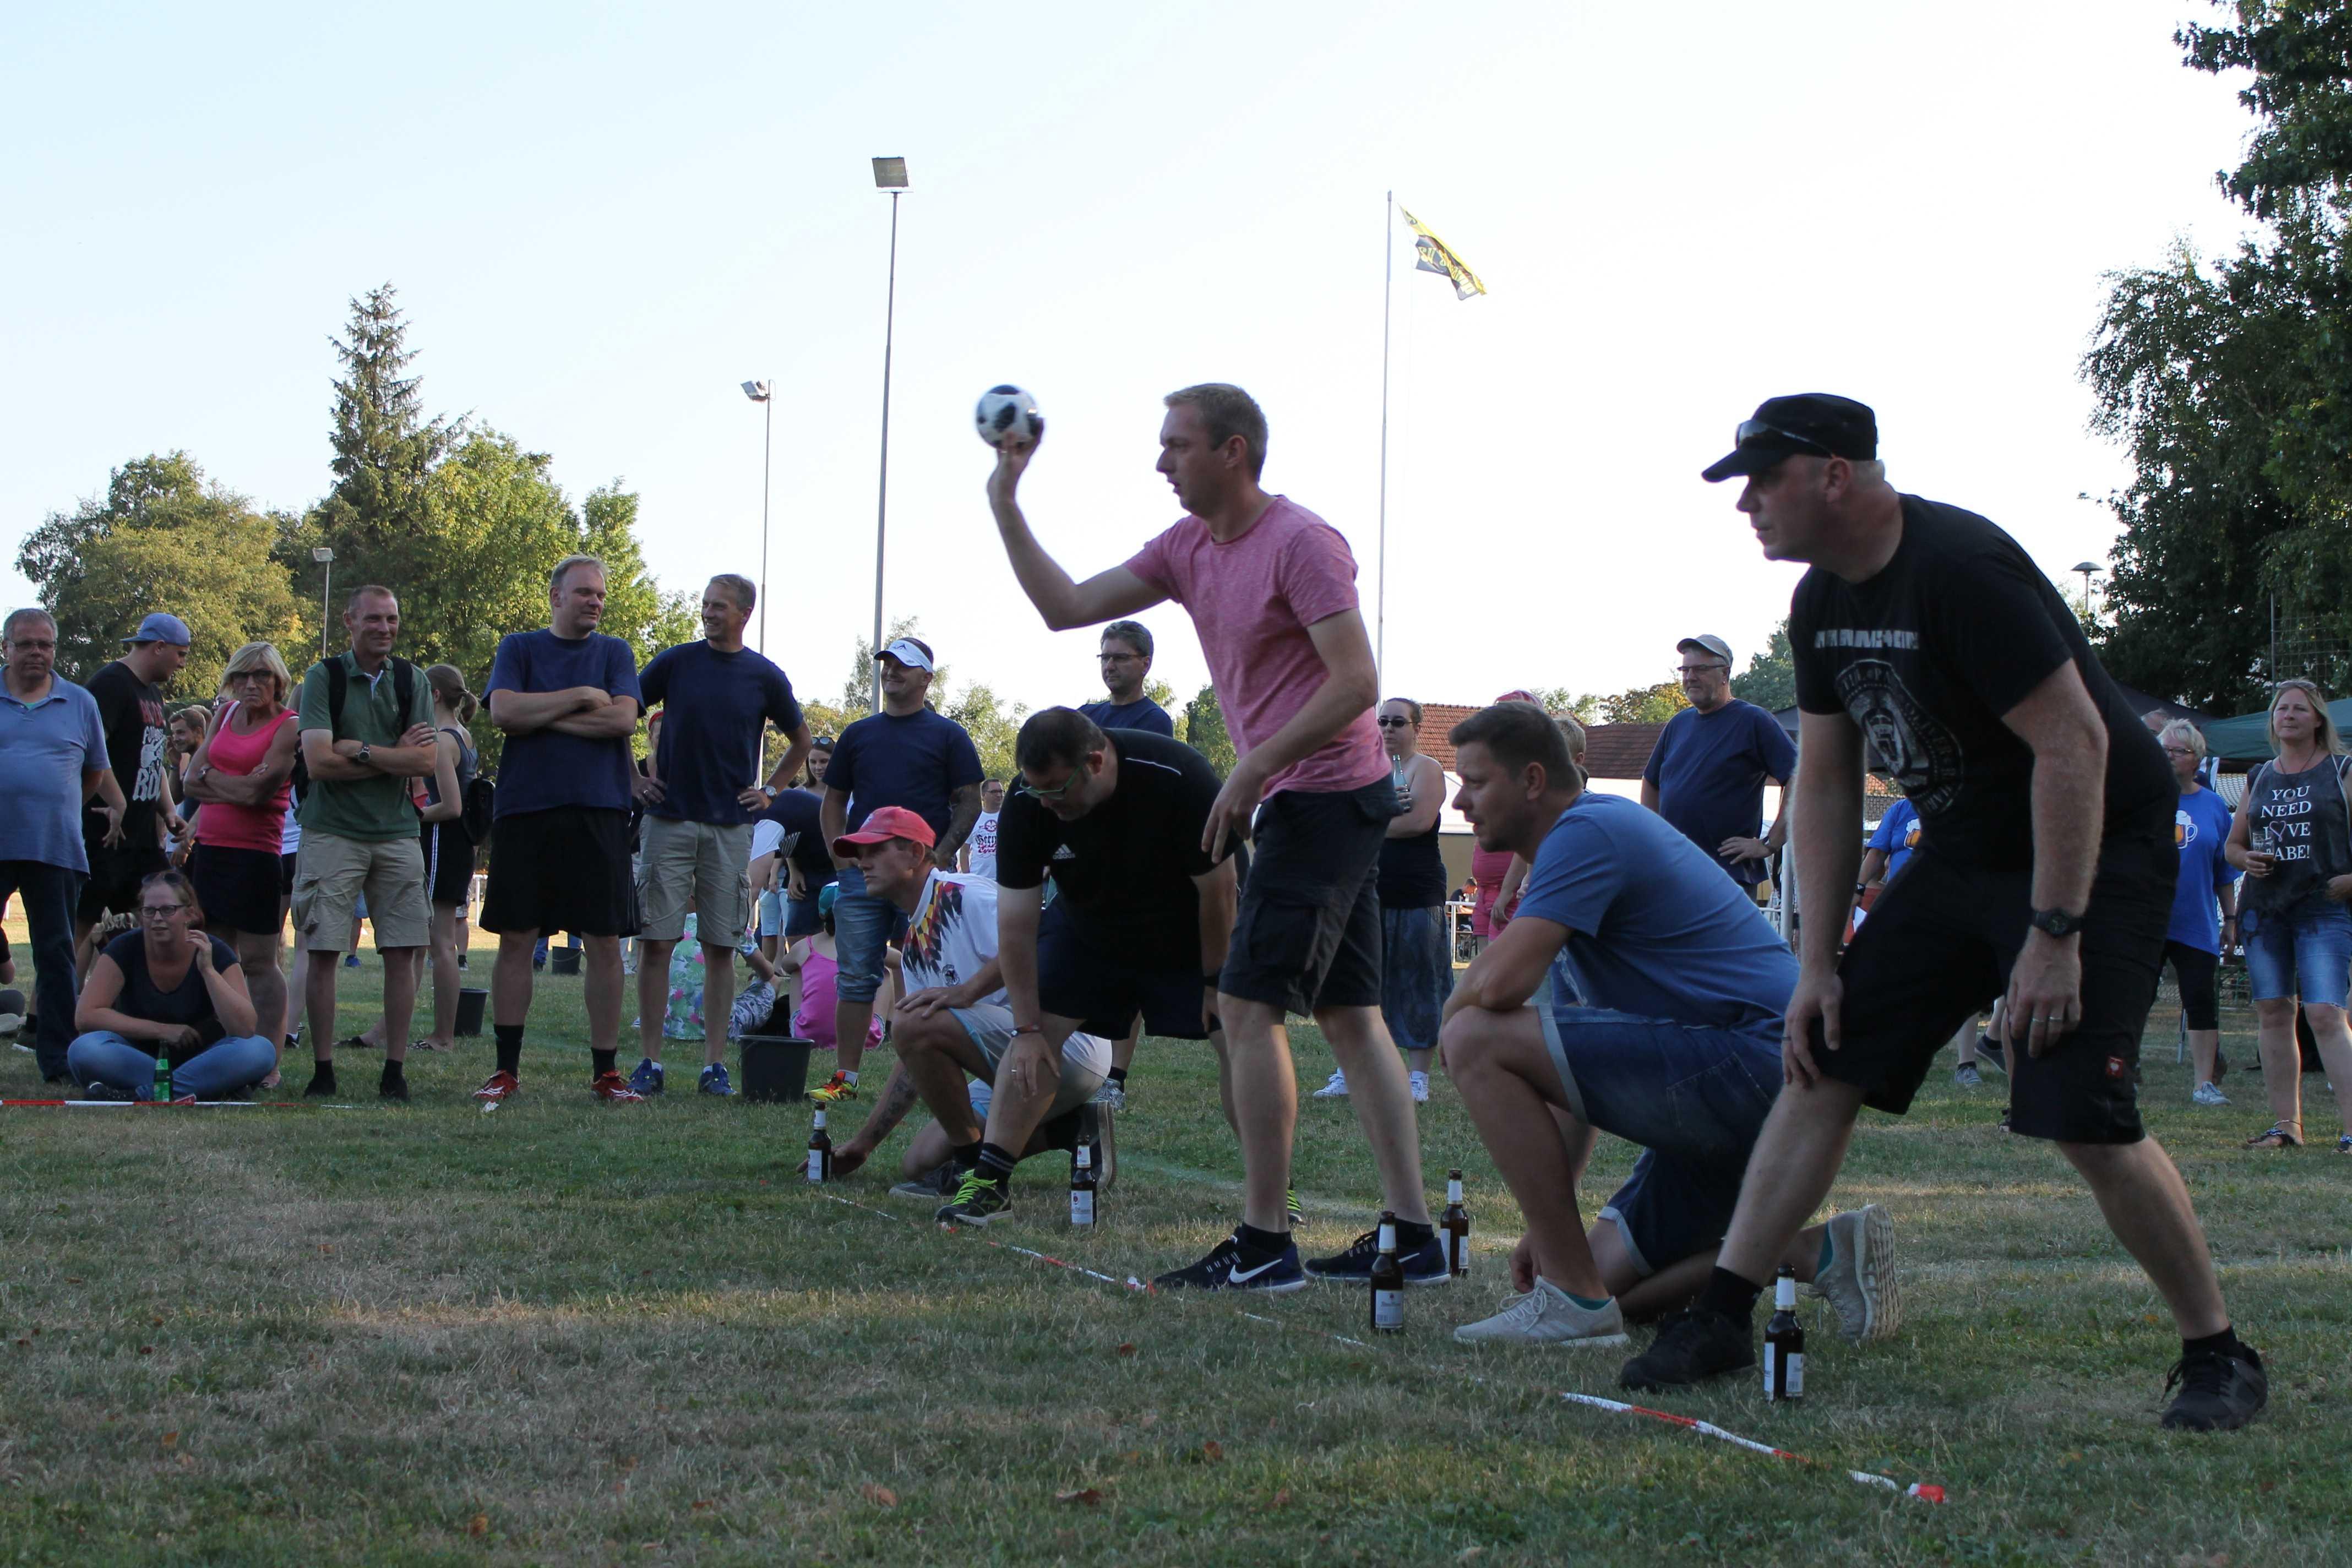 2018-07-27 Sportwoche - Flunkyball Turnier (29)